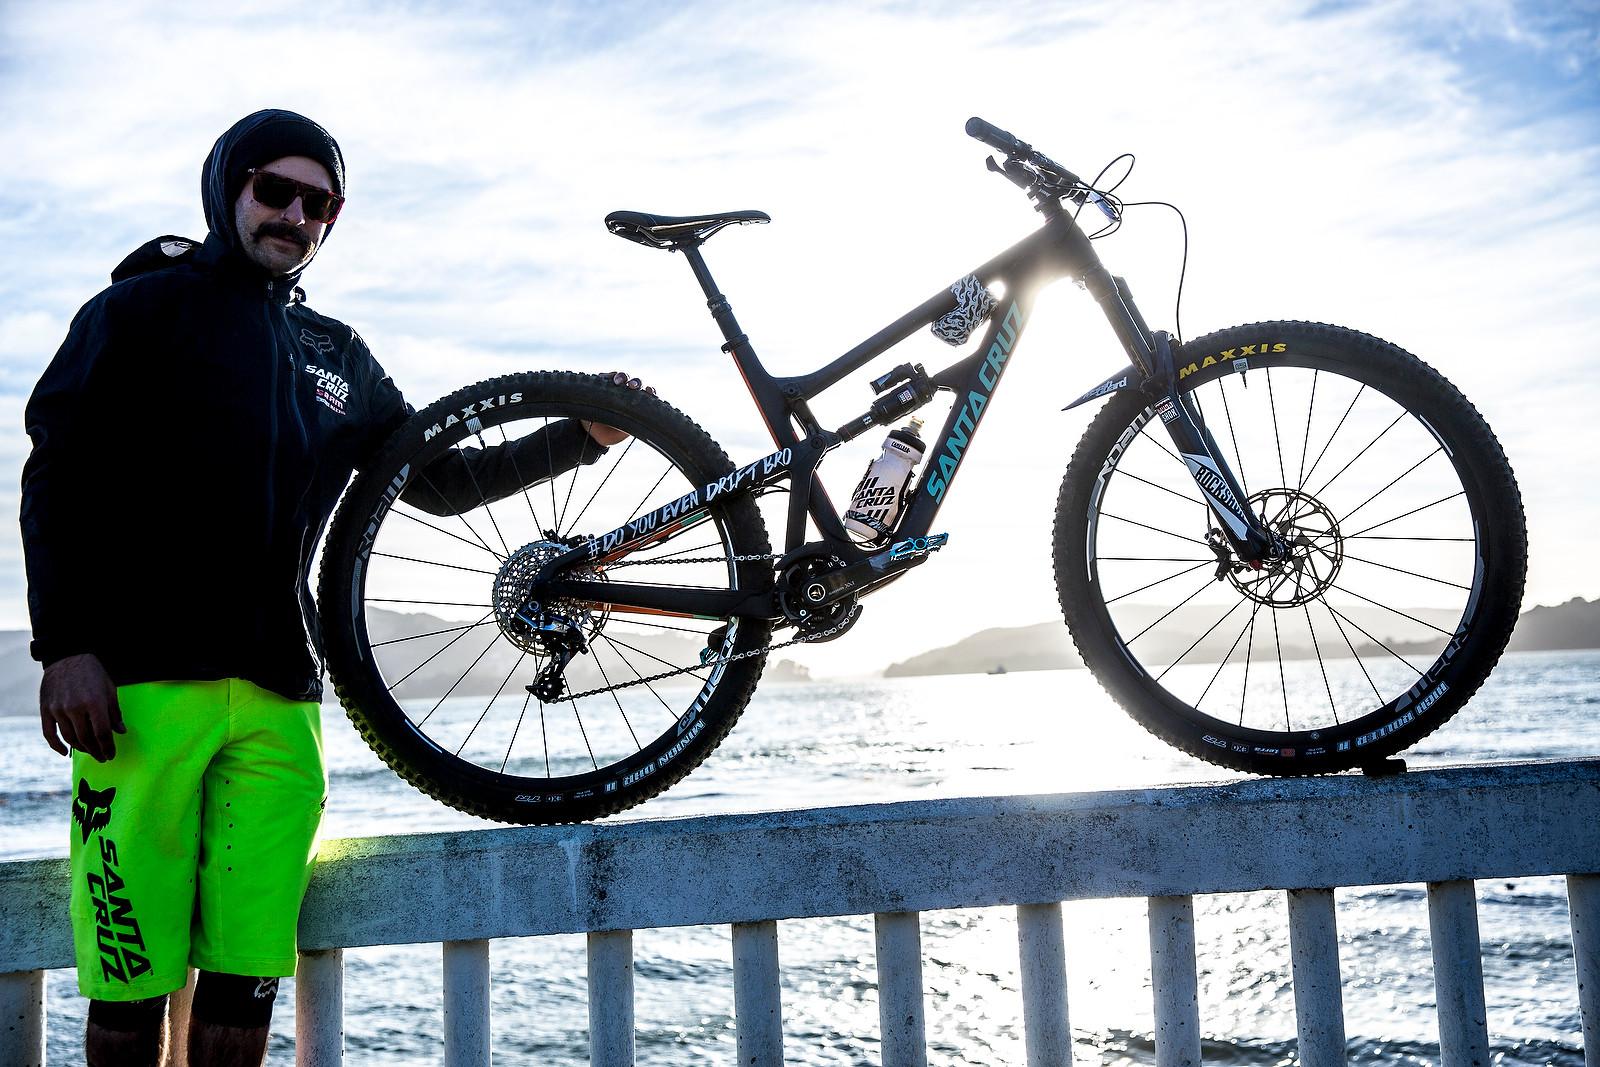 Iago Garay's Santa Cruz Hightower - PIT BITS - Enduro World Series, Corral, Chile - Mountain Biking Pictures - Vital MTB